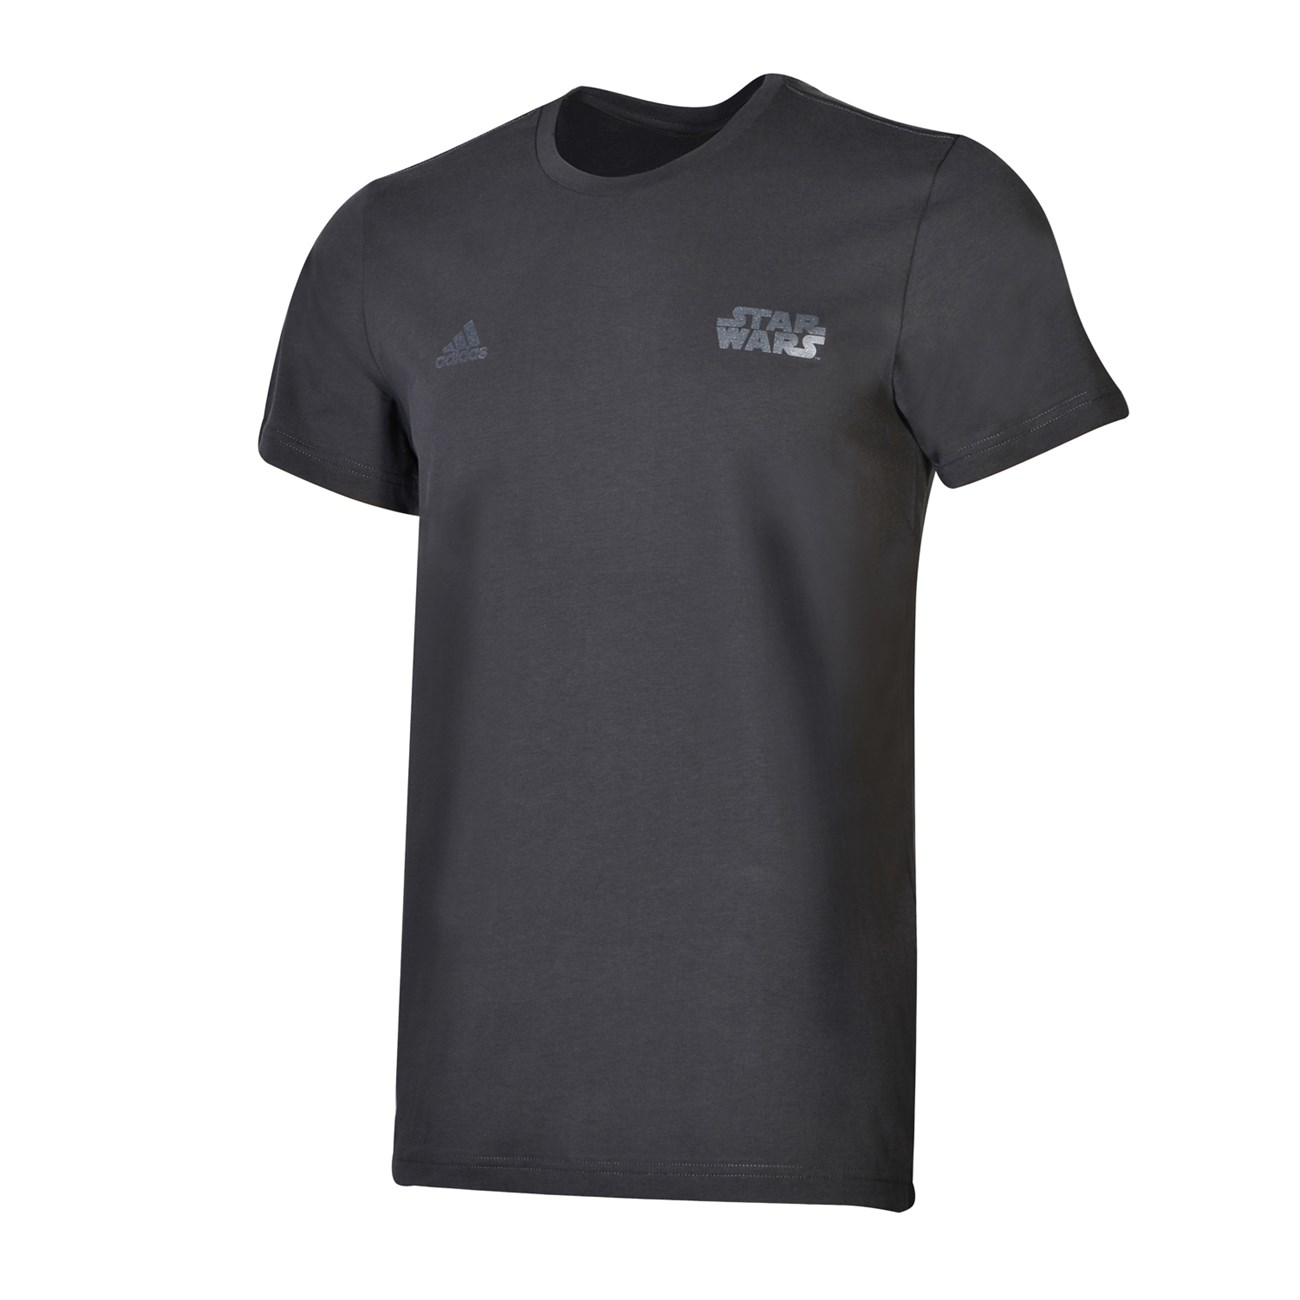 ADIDAS STAR WARS   Ανδρικά T-shirts  24606c7831d